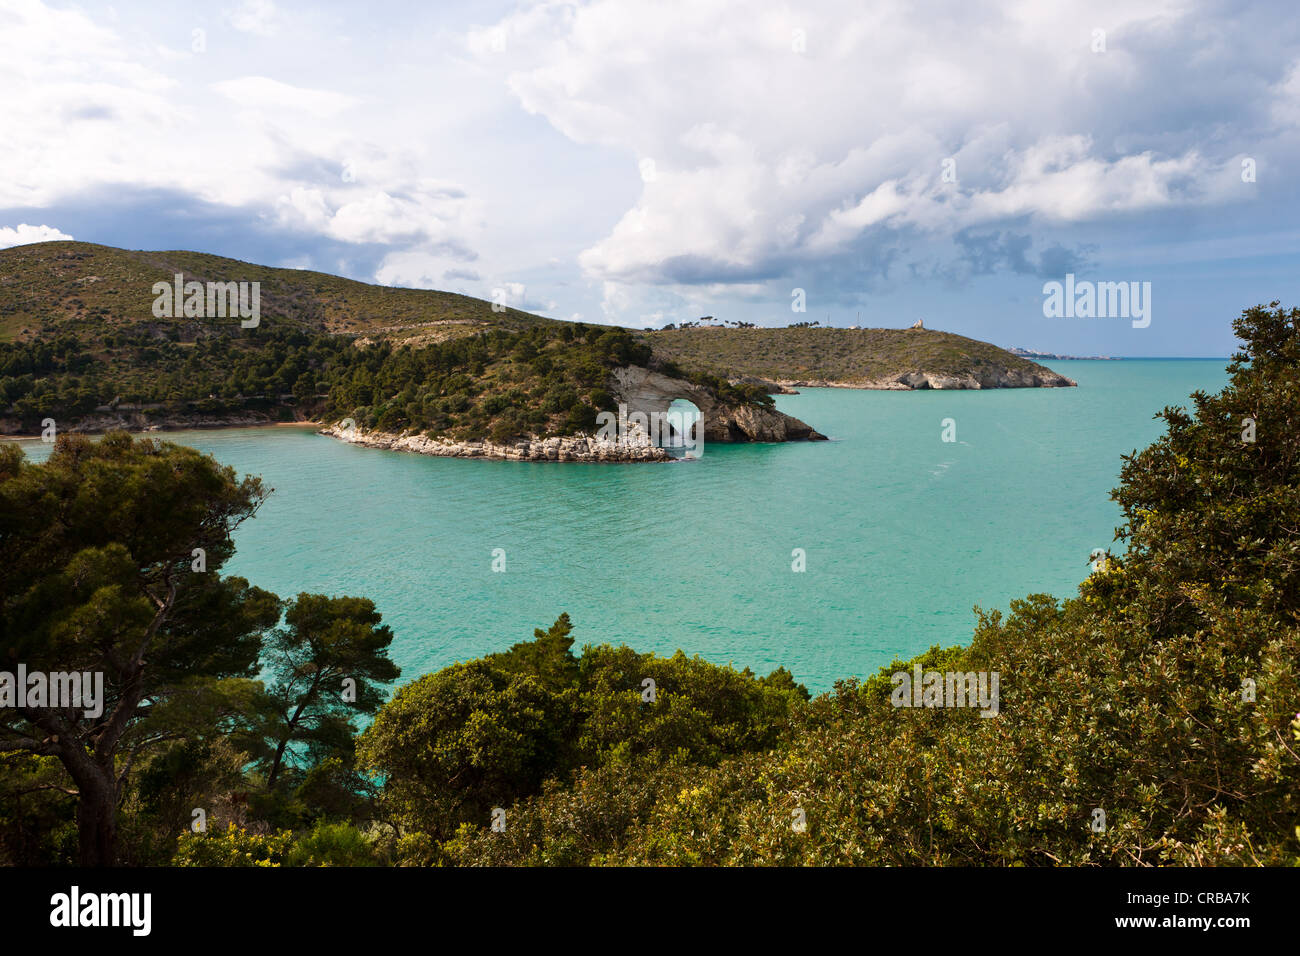 Coast near Gargano, Architello San Felice, also known as the spur of the Italian boot, Foggia Province, Apulia, - Stock Image